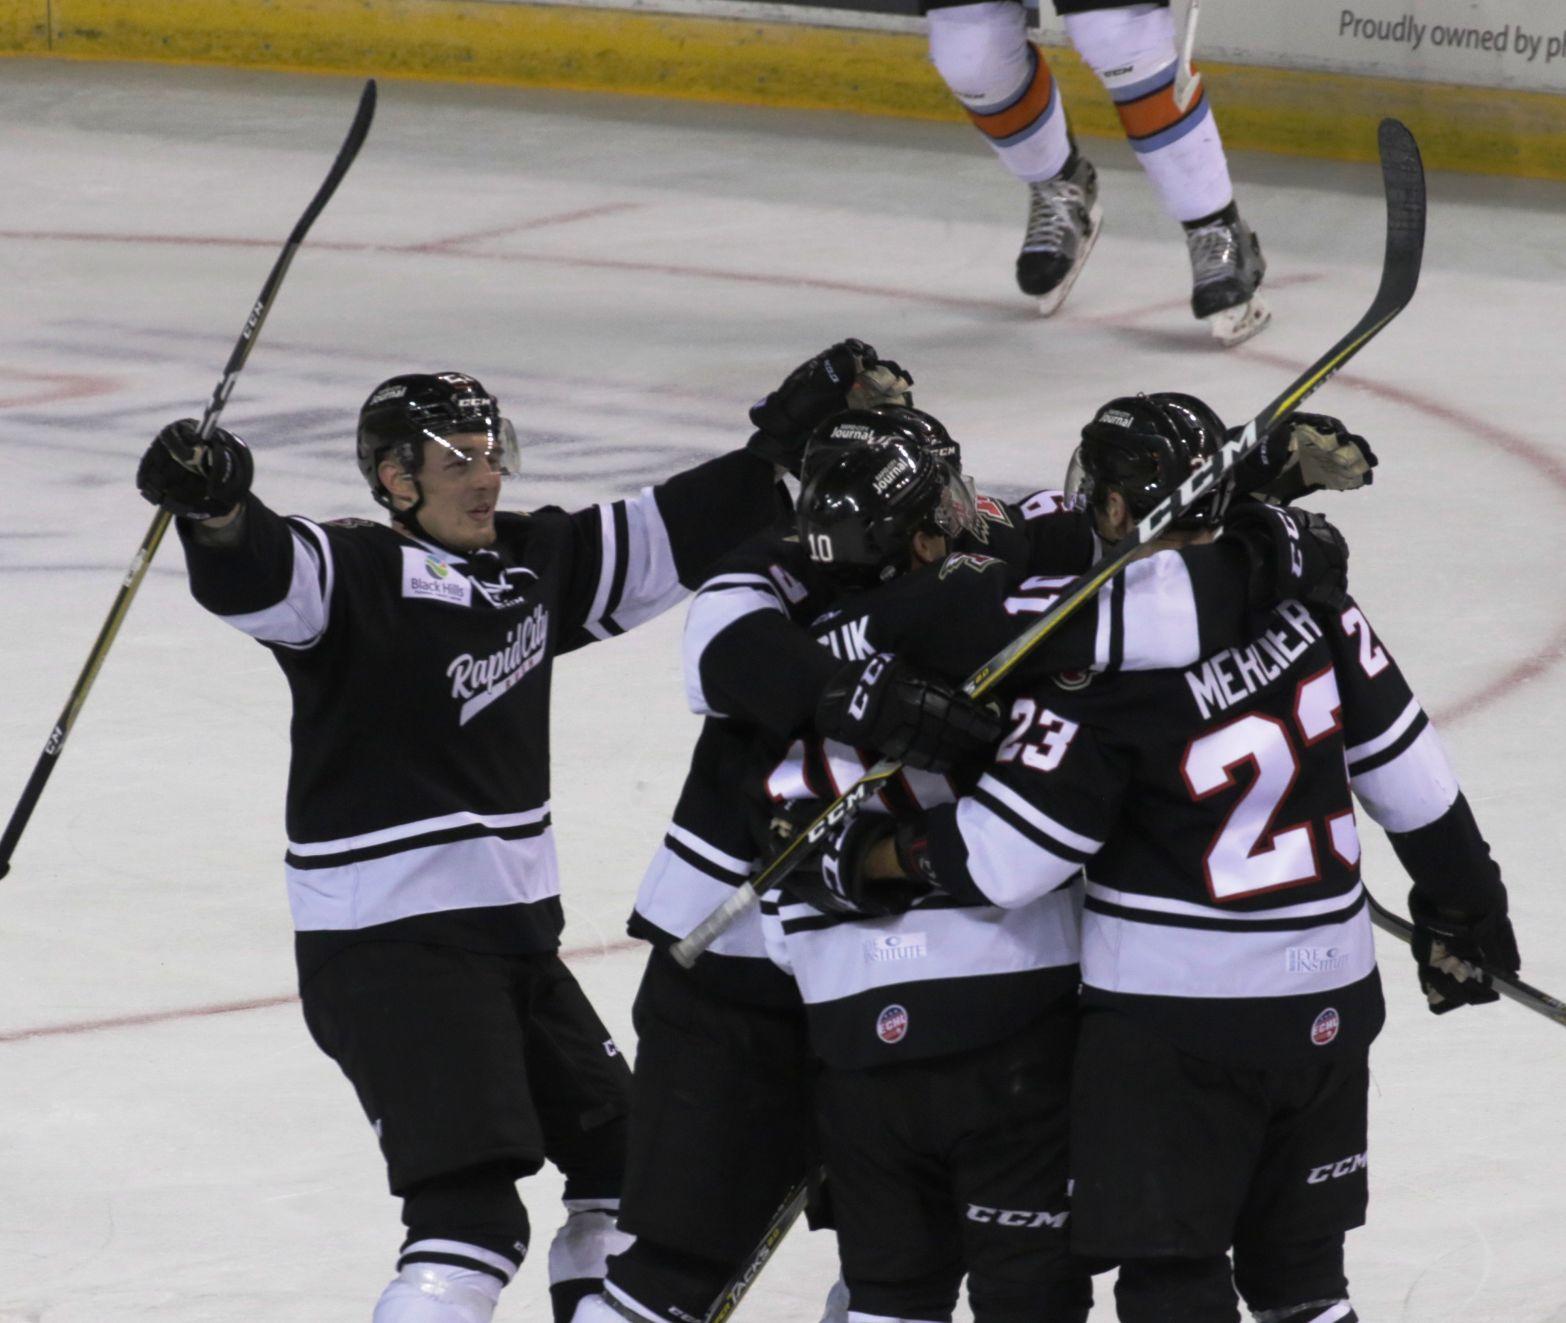 ECHL: Rush Riding Winning Streak After 3 Close Wins In Tulsa